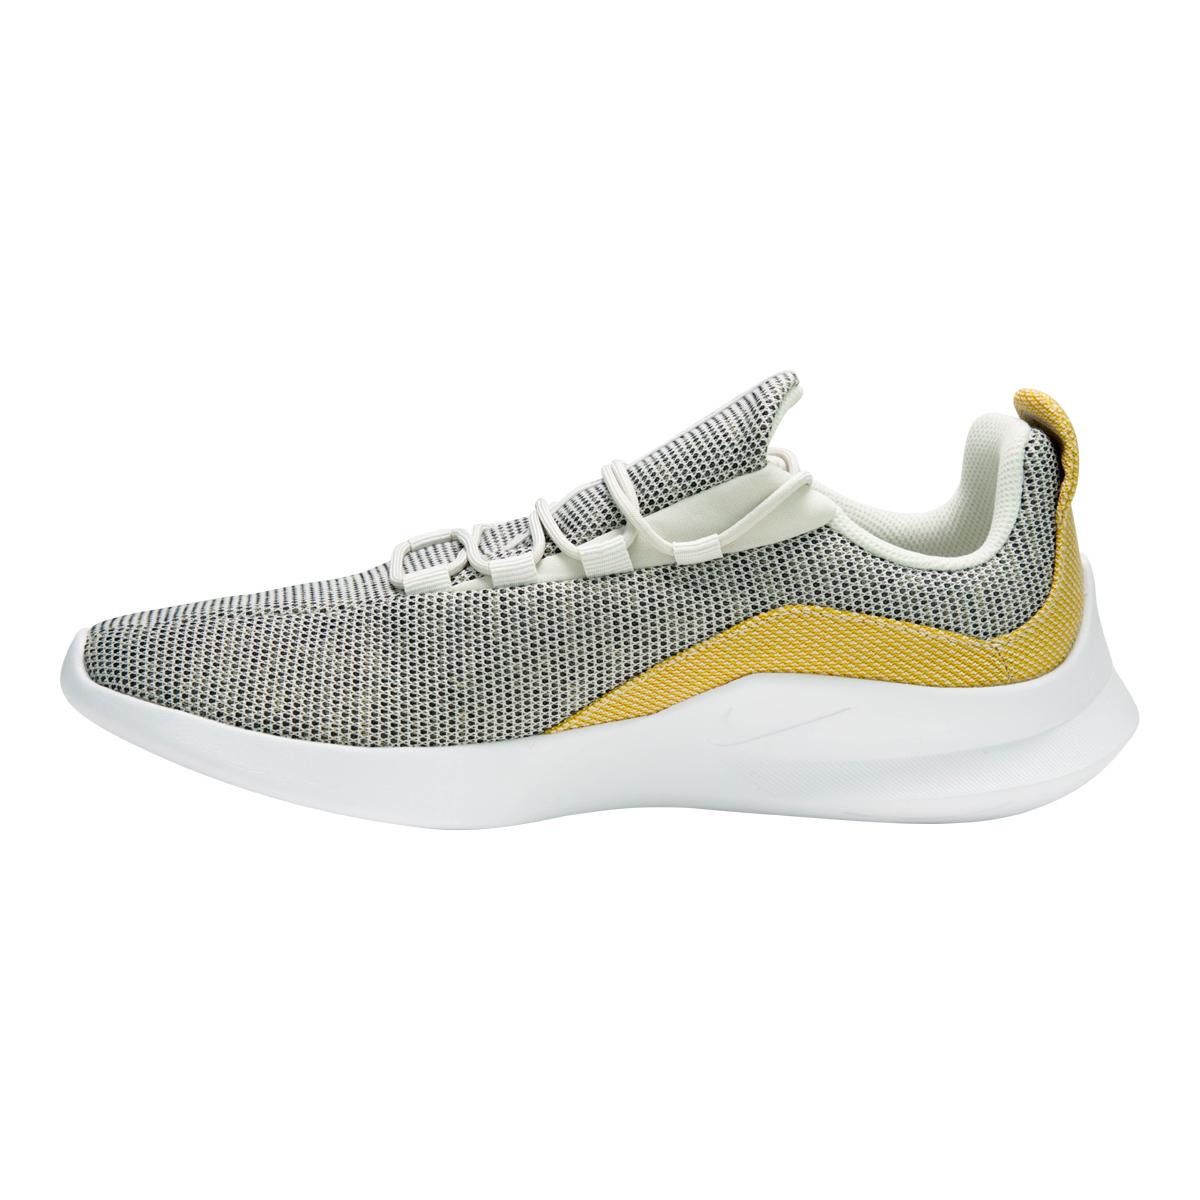 Nike-Men-039-s-Viale-Premium-Running-Shoes thumbnail 13